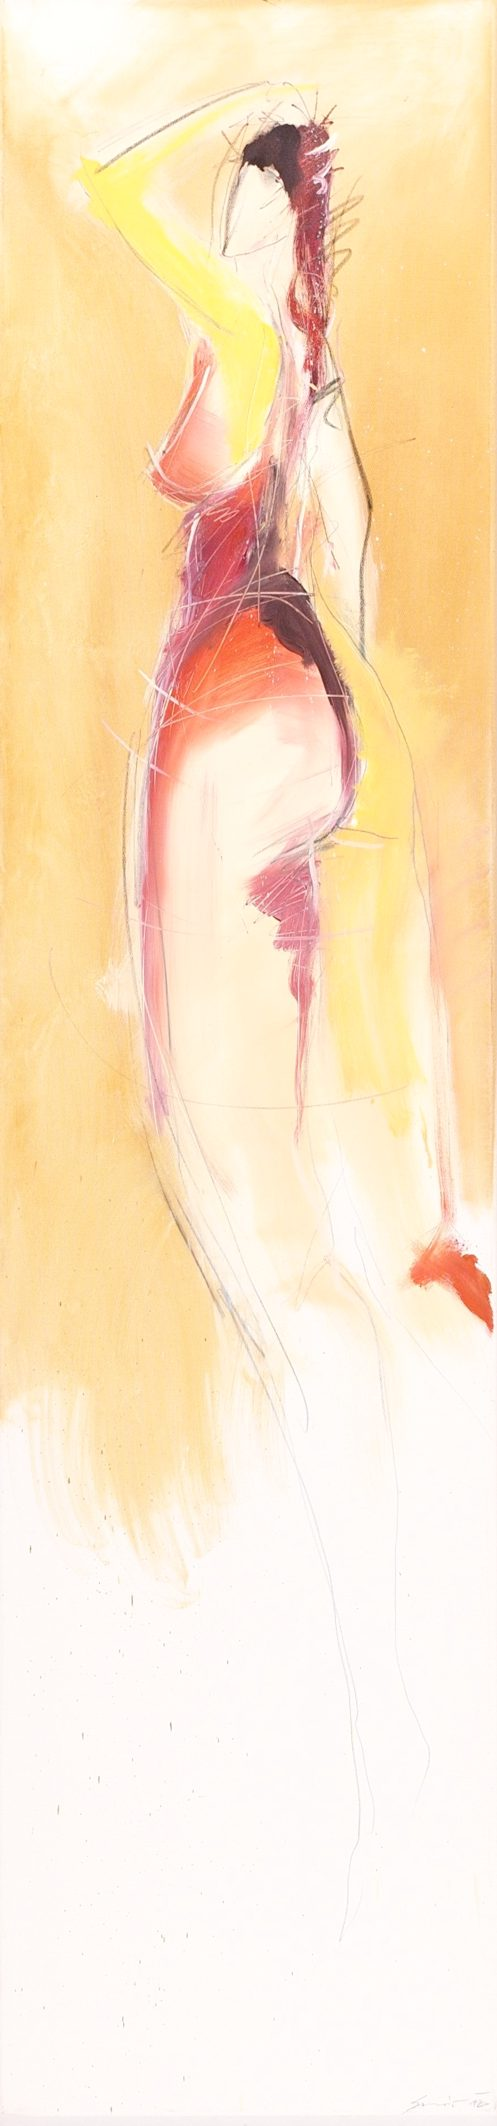 Savio Verra Painting: Souldancer 2